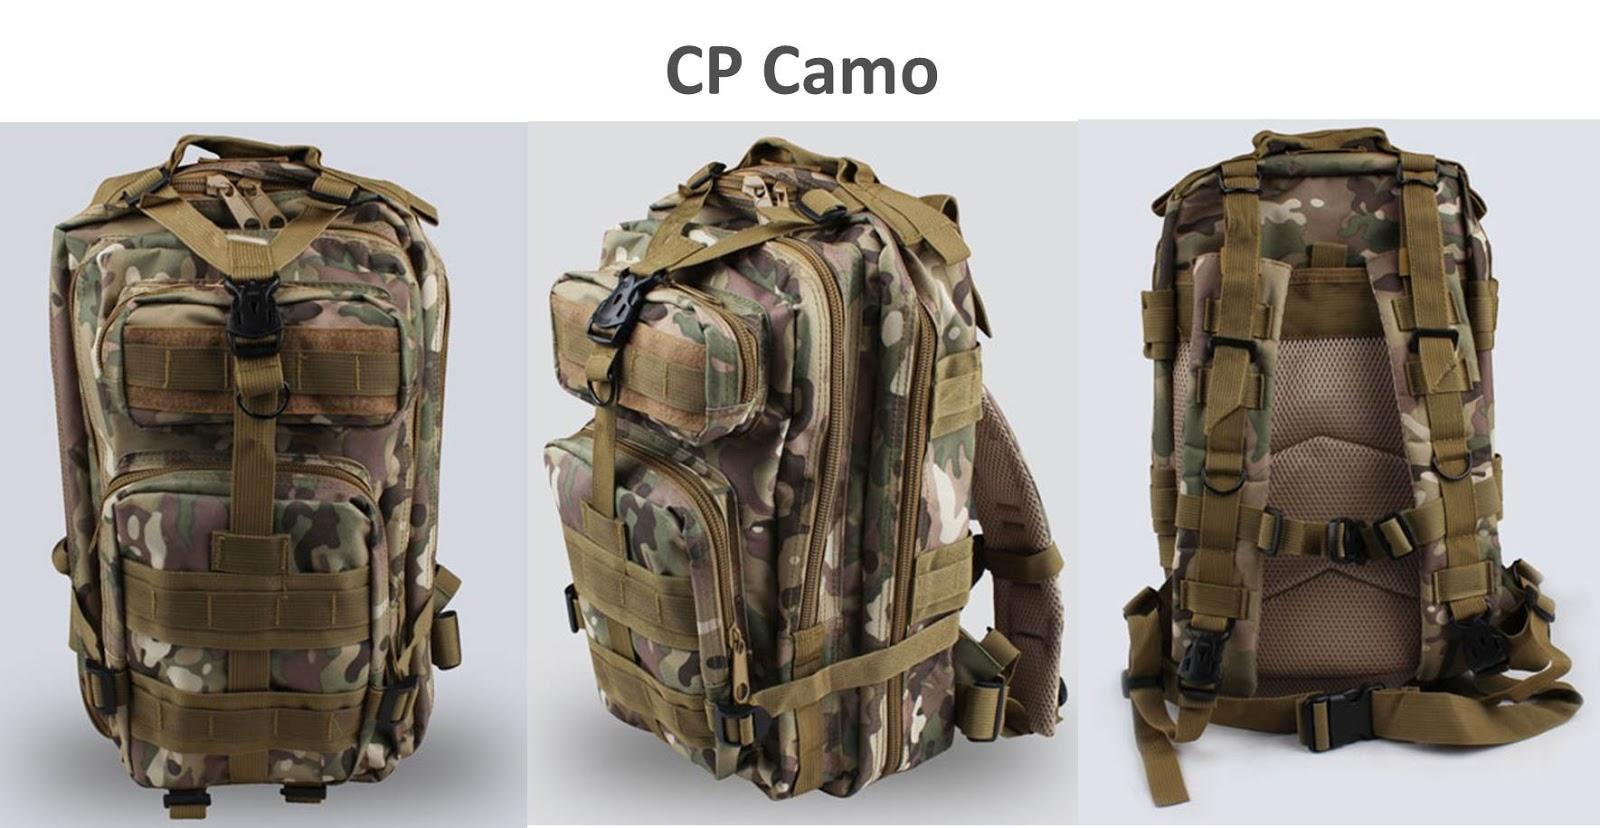 24l Army Bags - Lelong%2B7_Simple 24l Army Bags - Lelong%2B7  Collection_959317.jpg